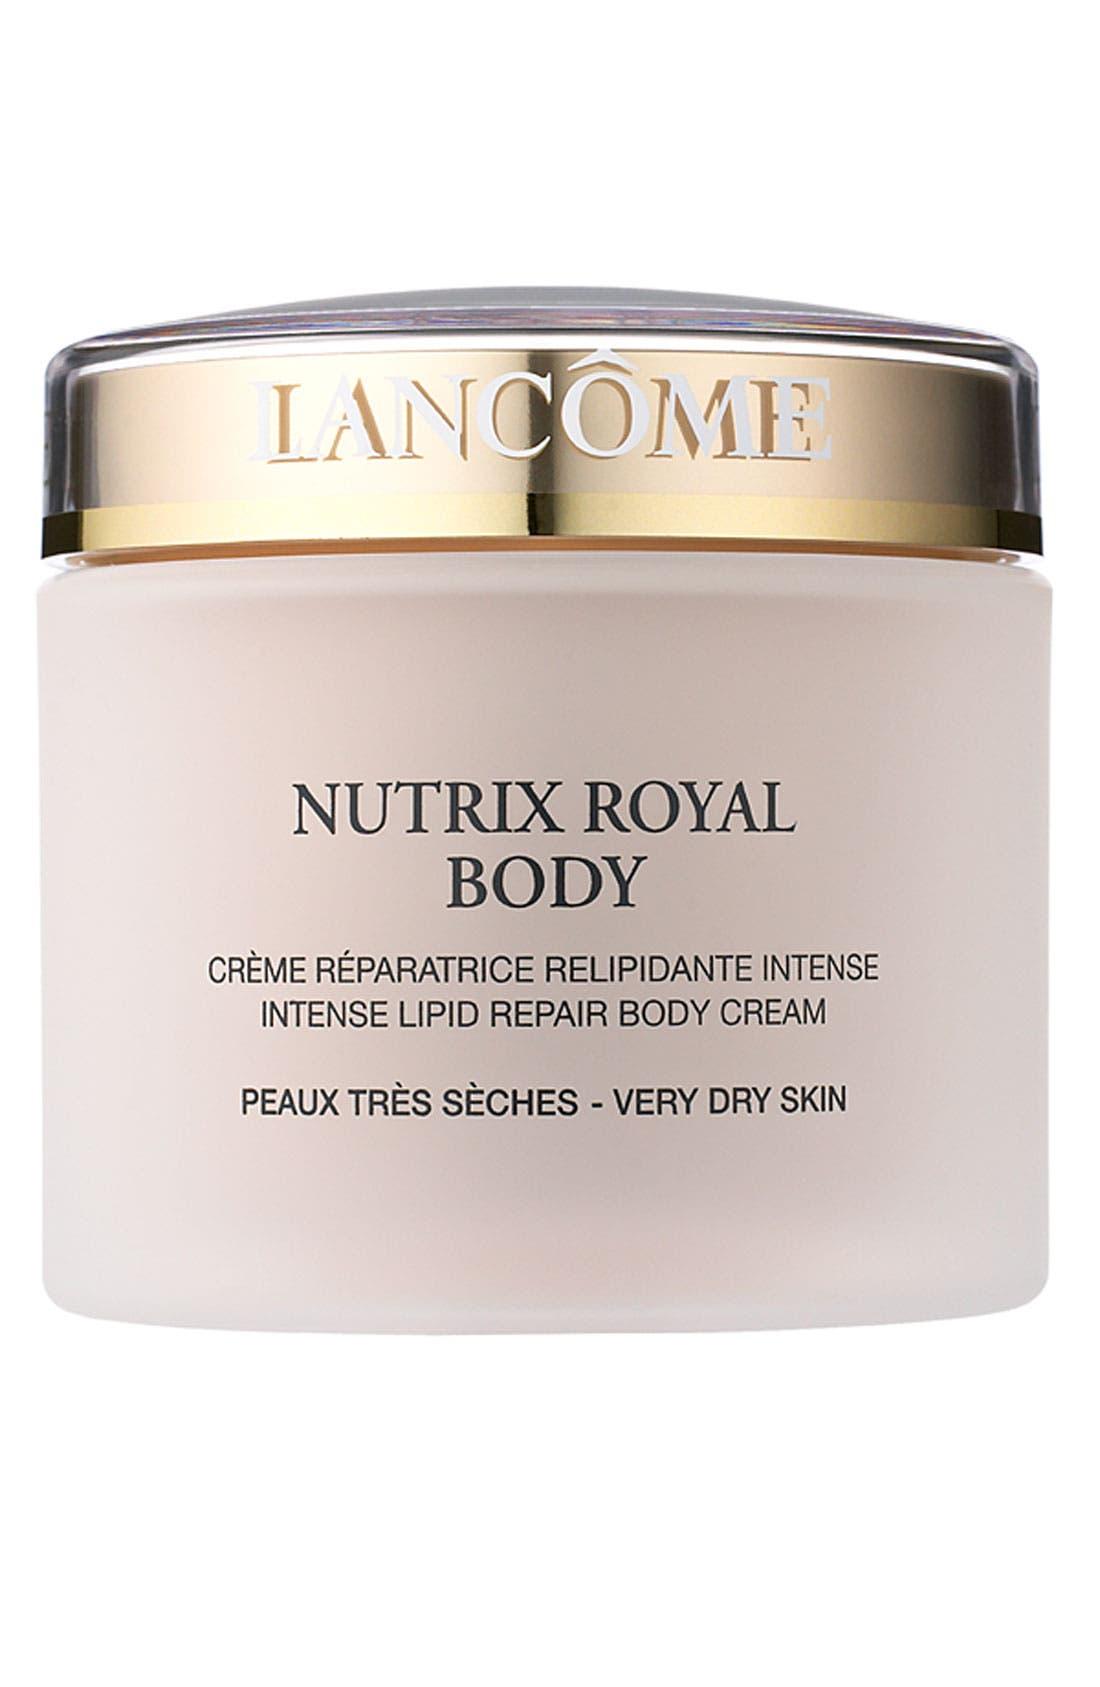 Nutrix Royal Body Nourishing & Restoring Body Butter | Nordstrom